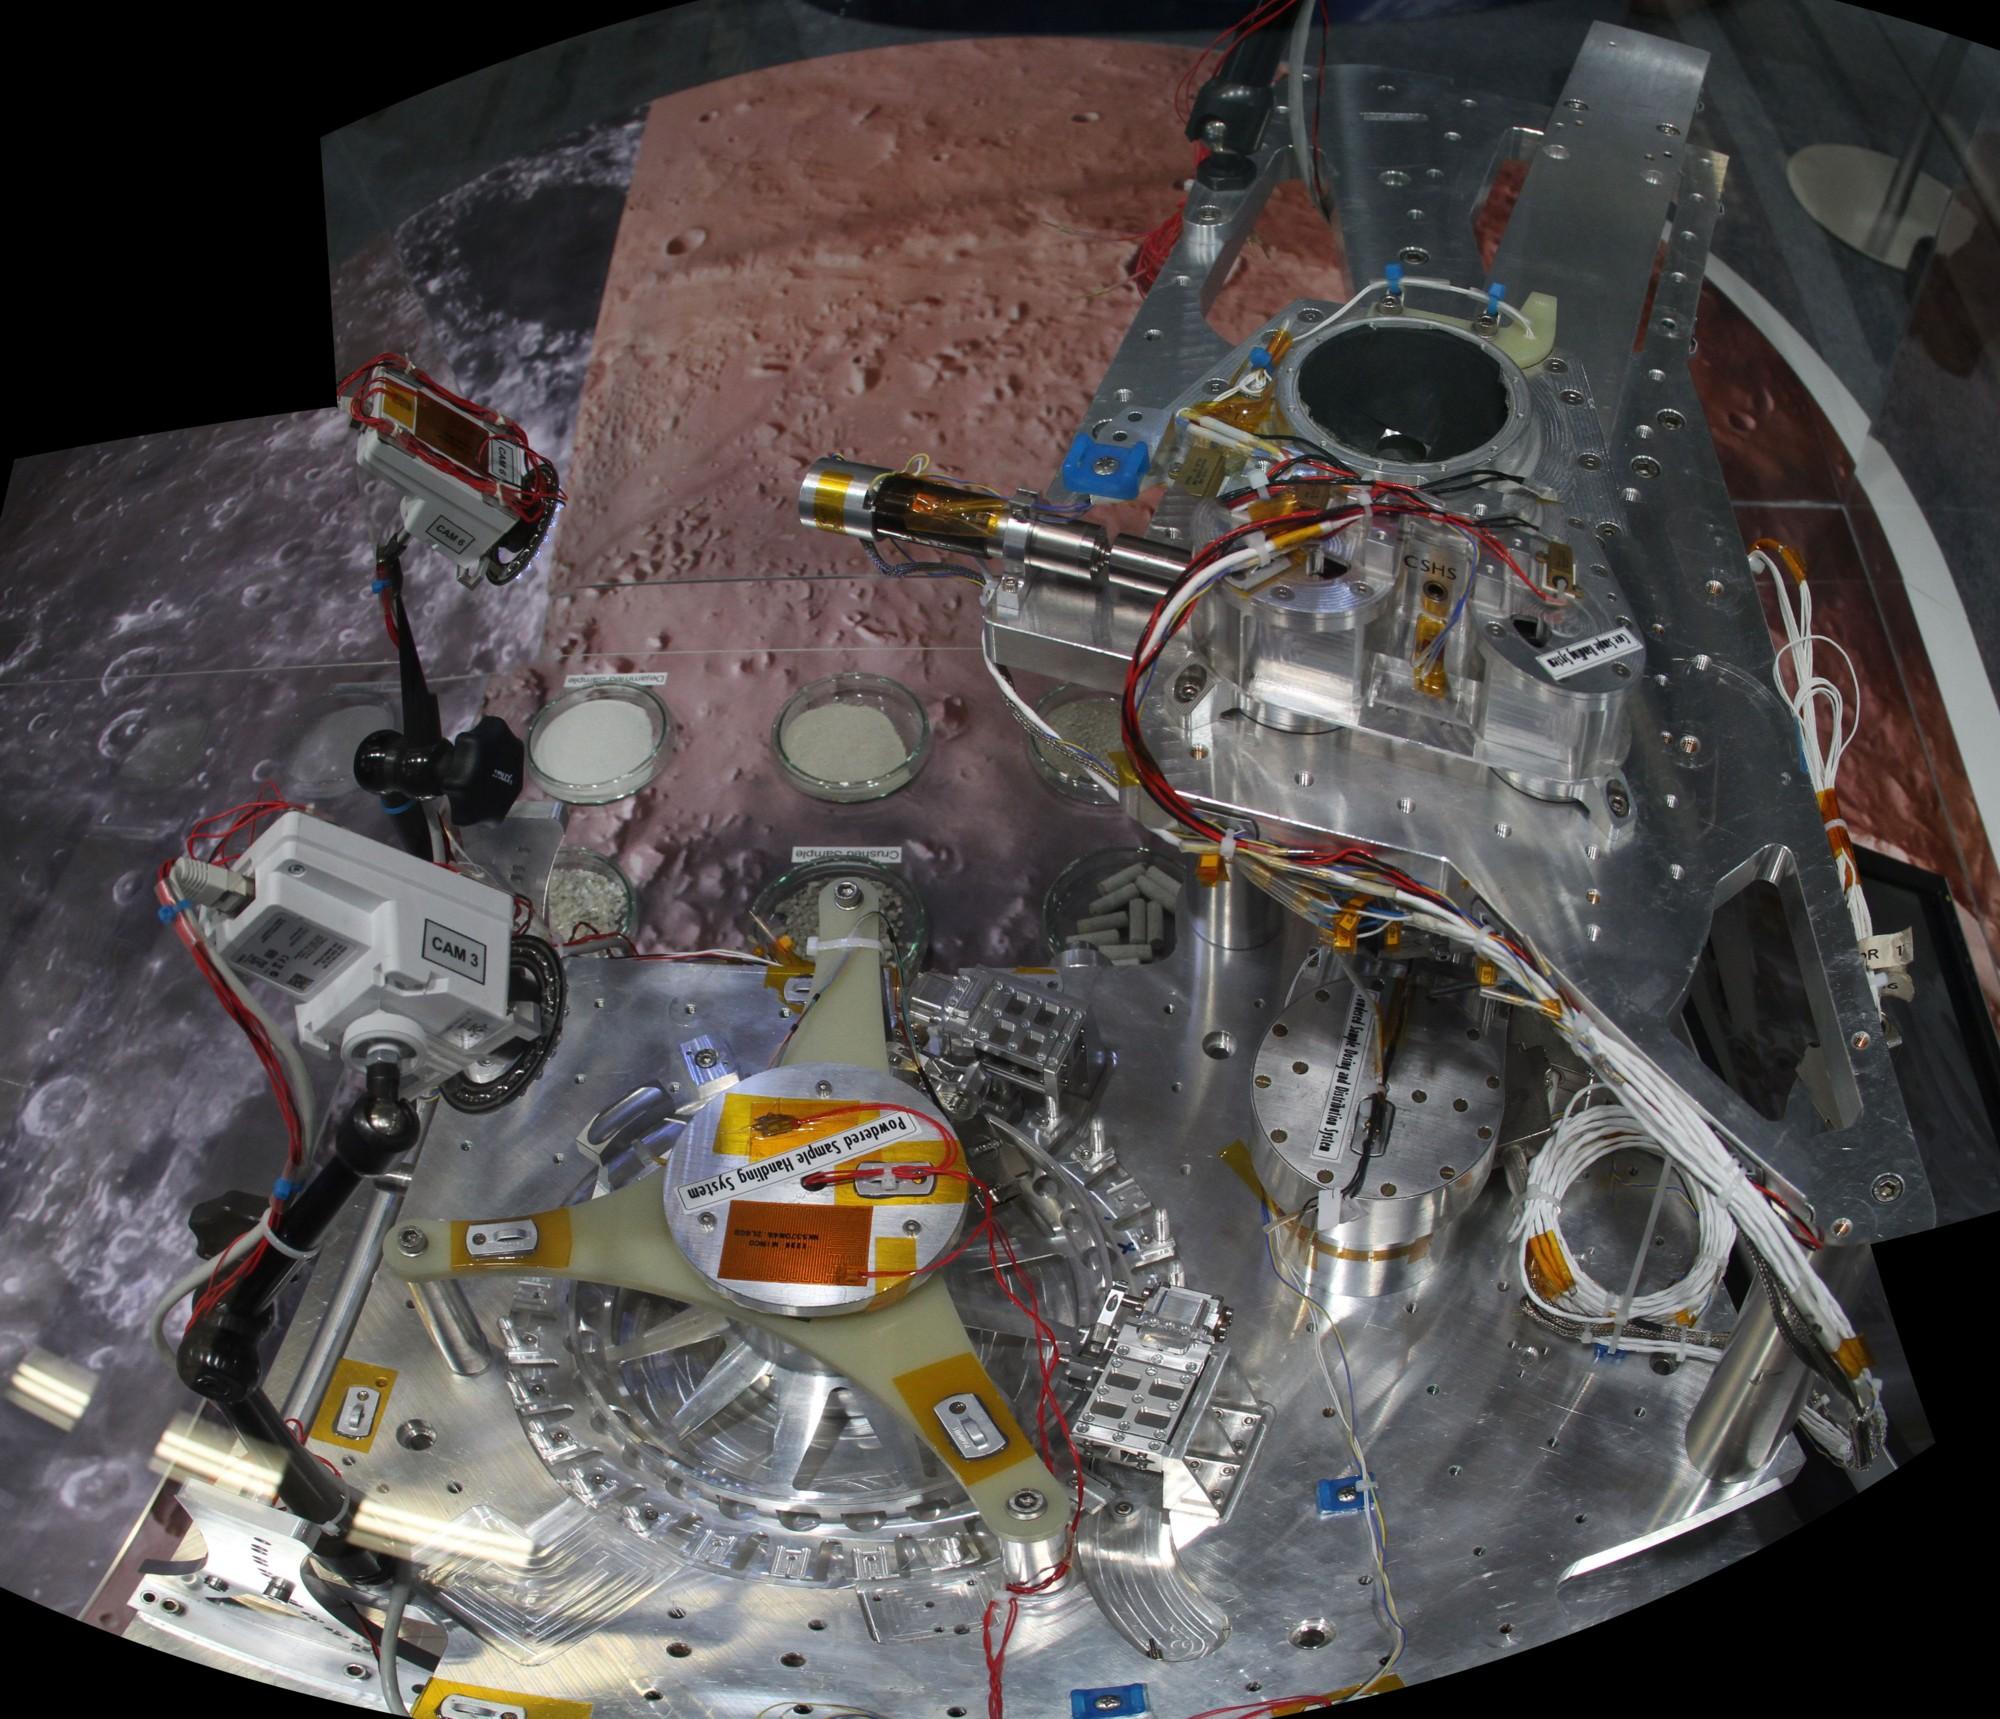 15 06 16 - 14h 42m 57s - Bourget OHB syst traitement ech ExoMars stitch r